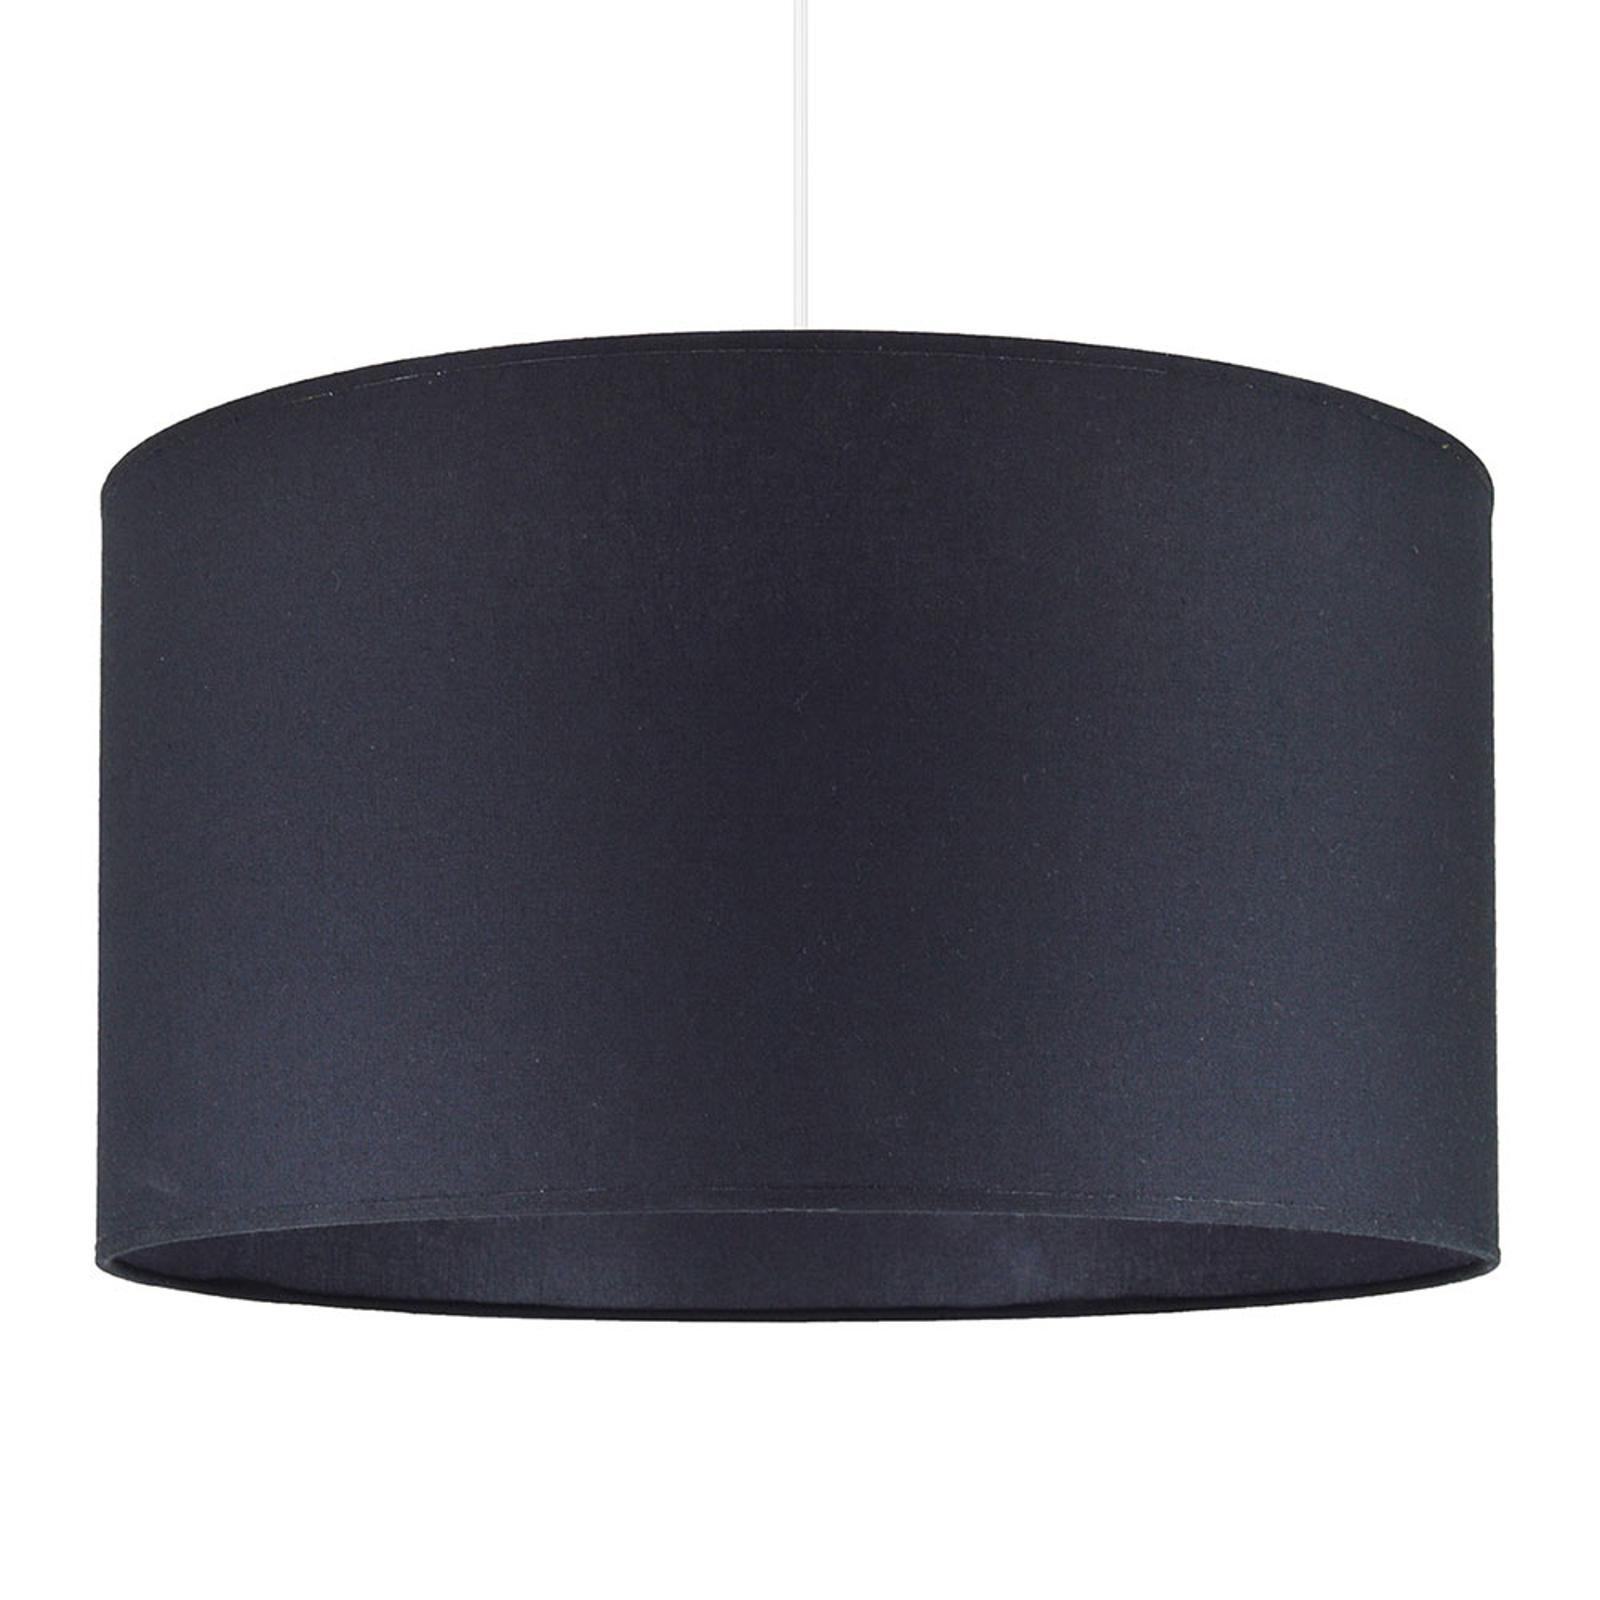 Lampa wisząca Roller, czarna